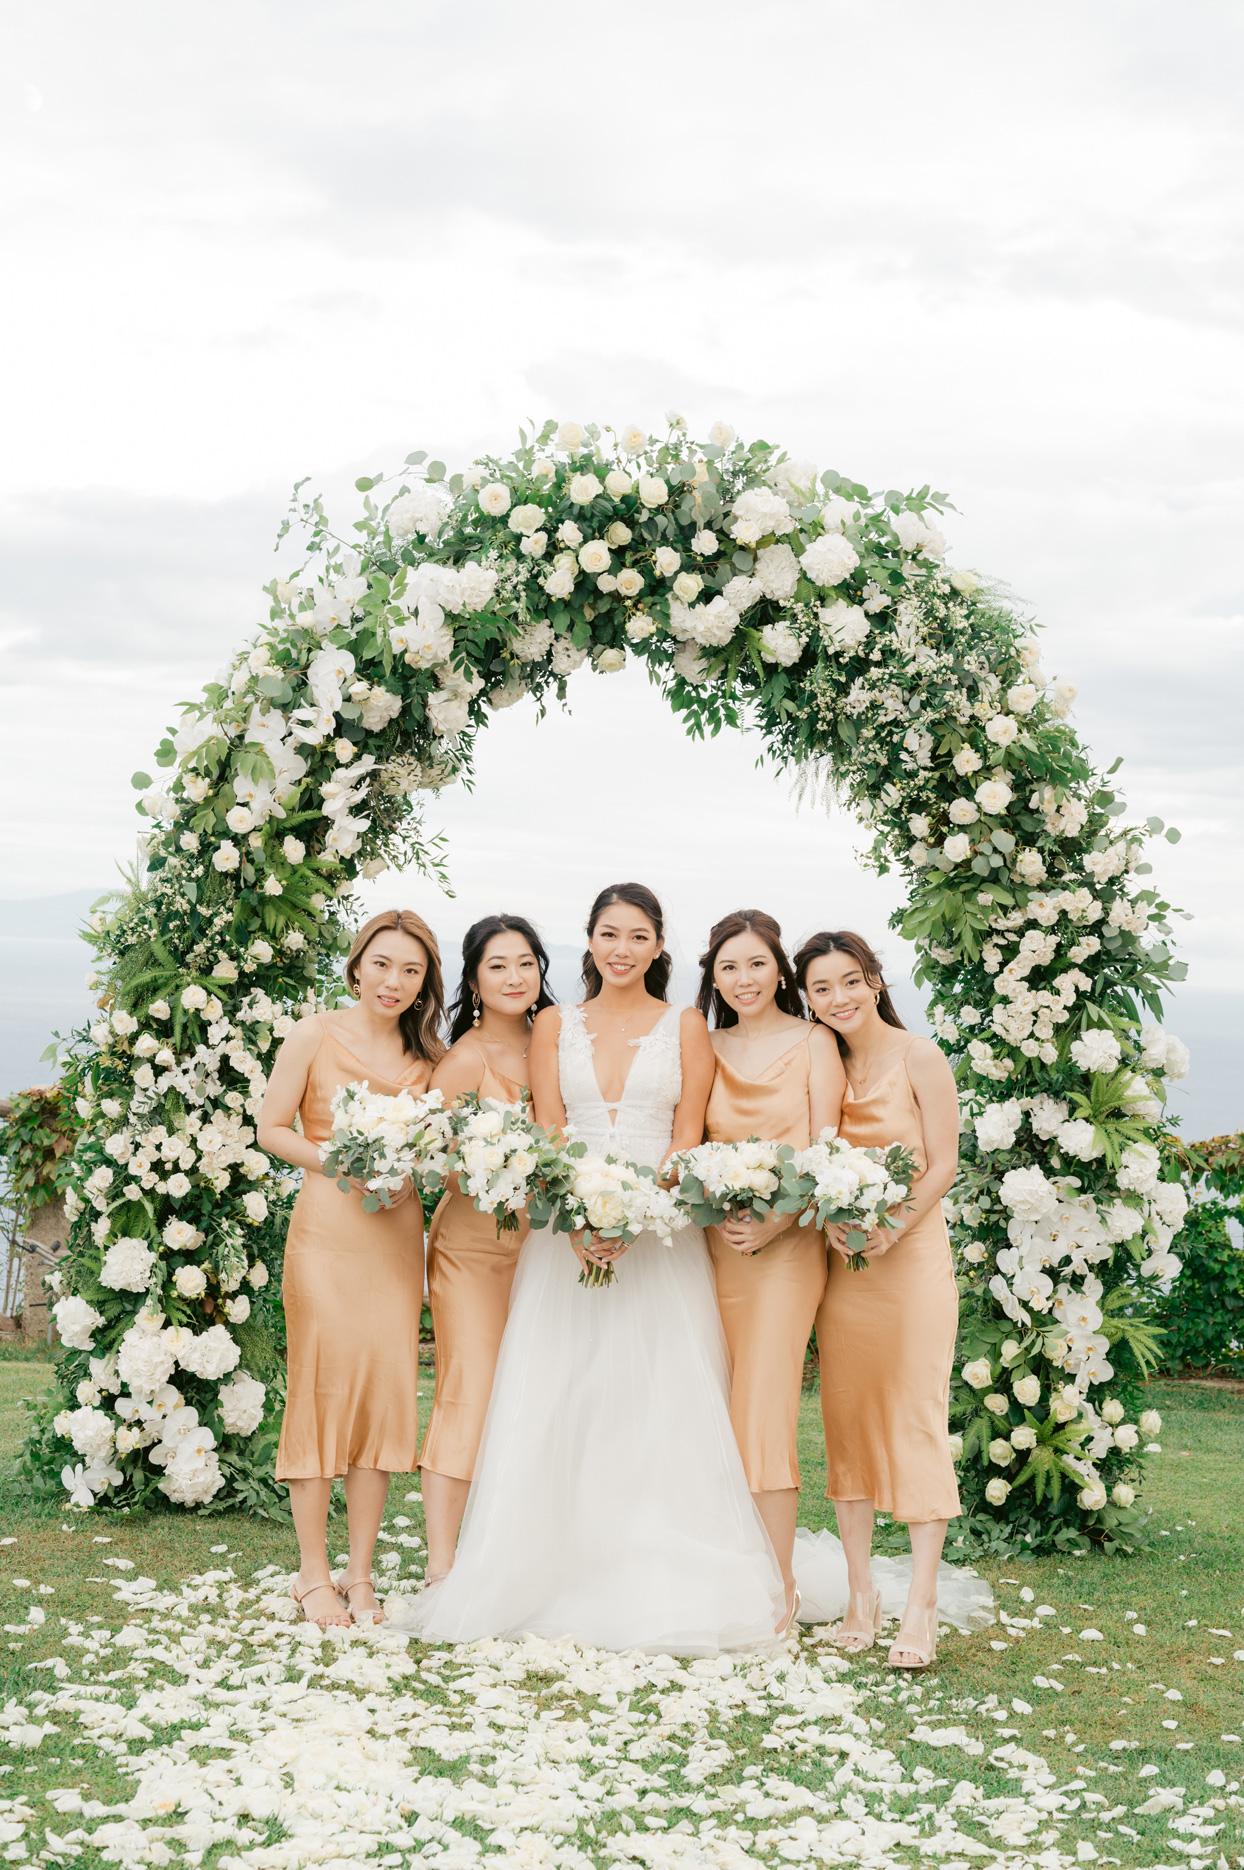 bride with bridesmaids wearing tea length orange dresses under floral wedding arch